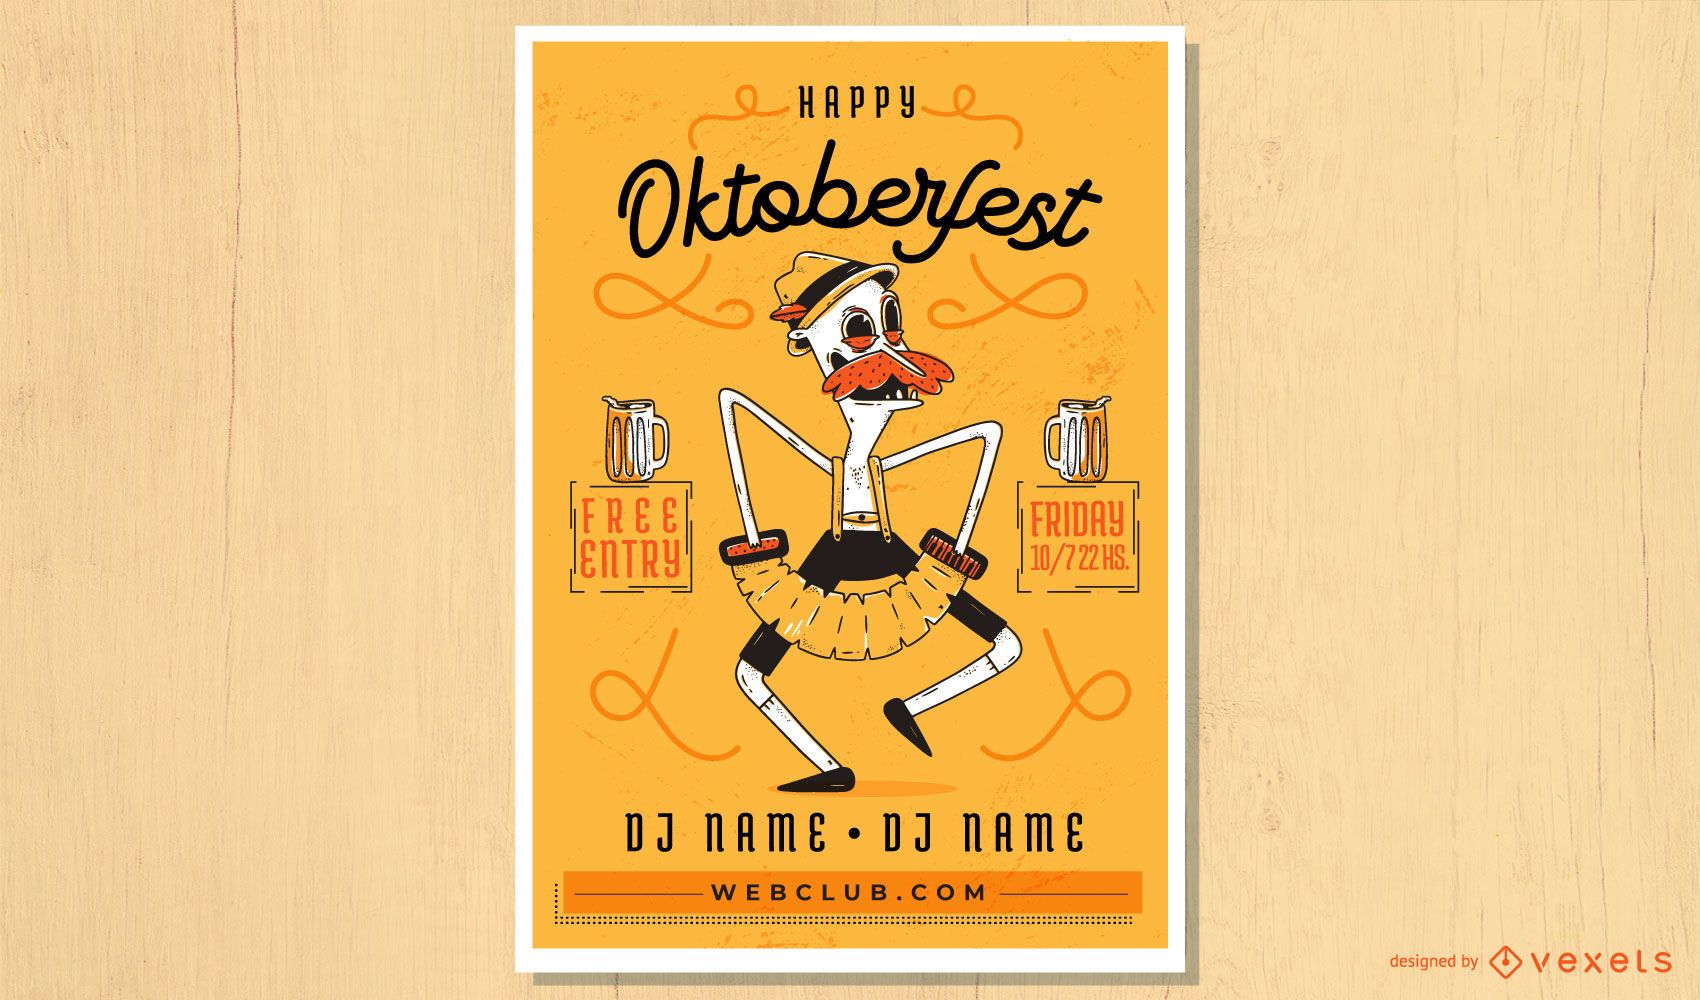 Oktoberfest concertina man poster design